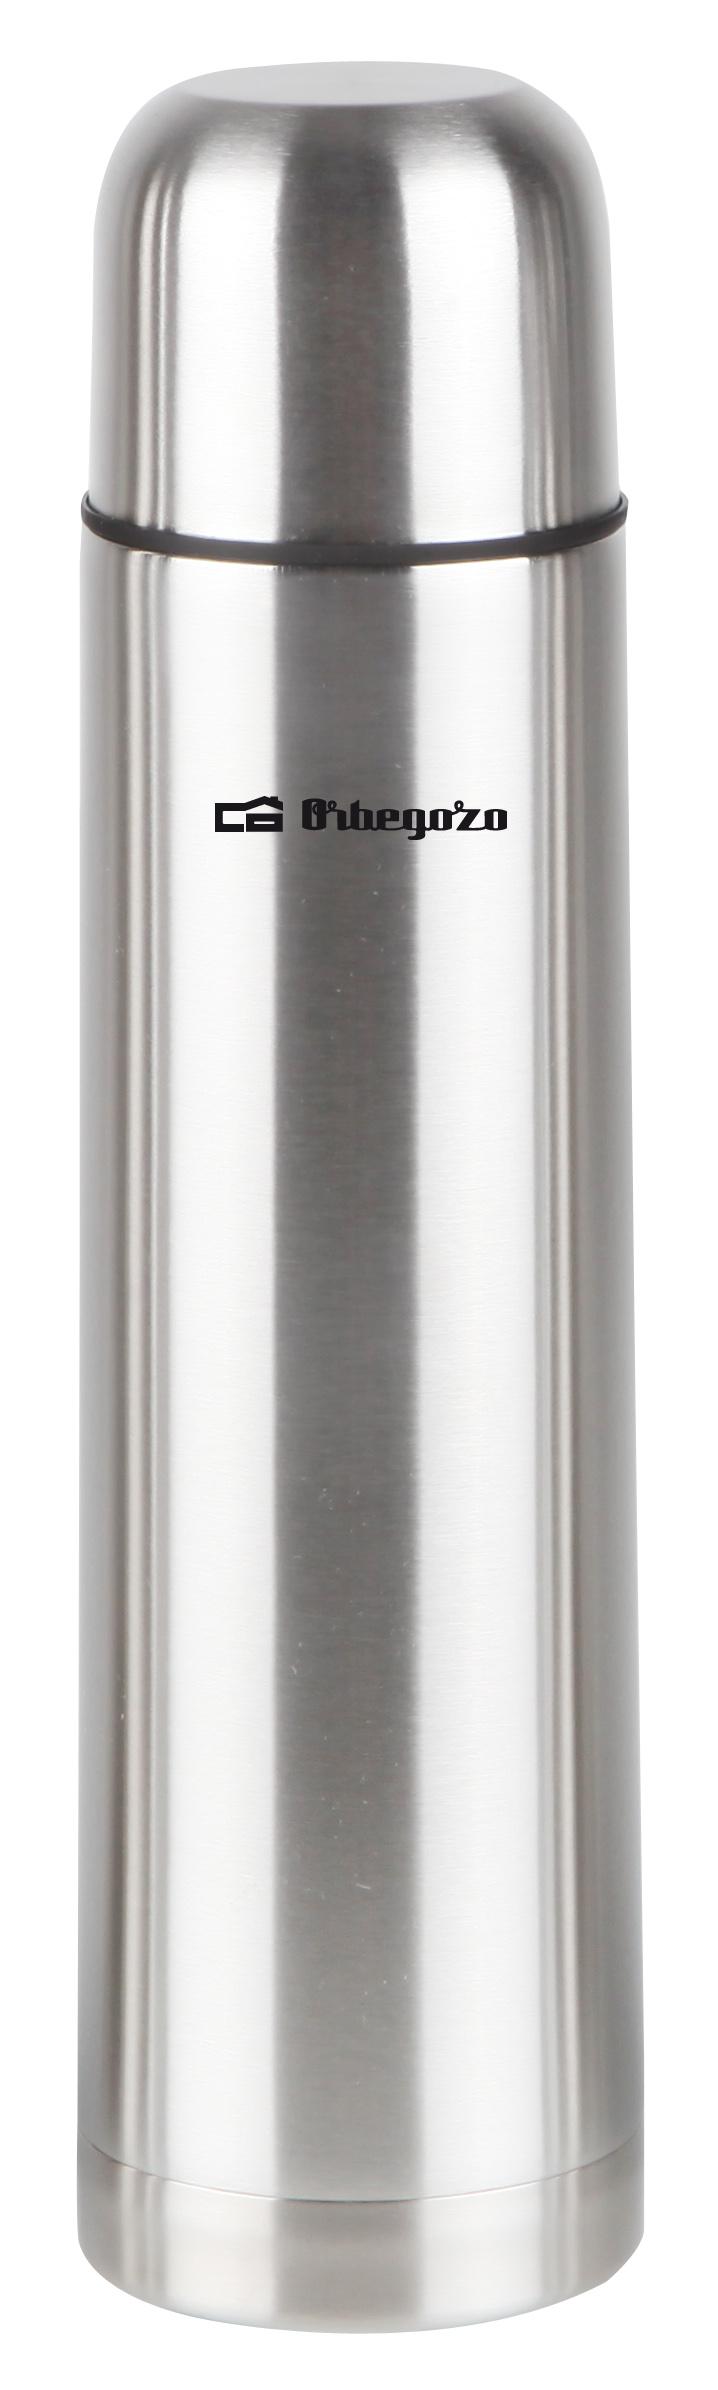 Termo Inox para Liquidos (750ml) - ORBEGOZO